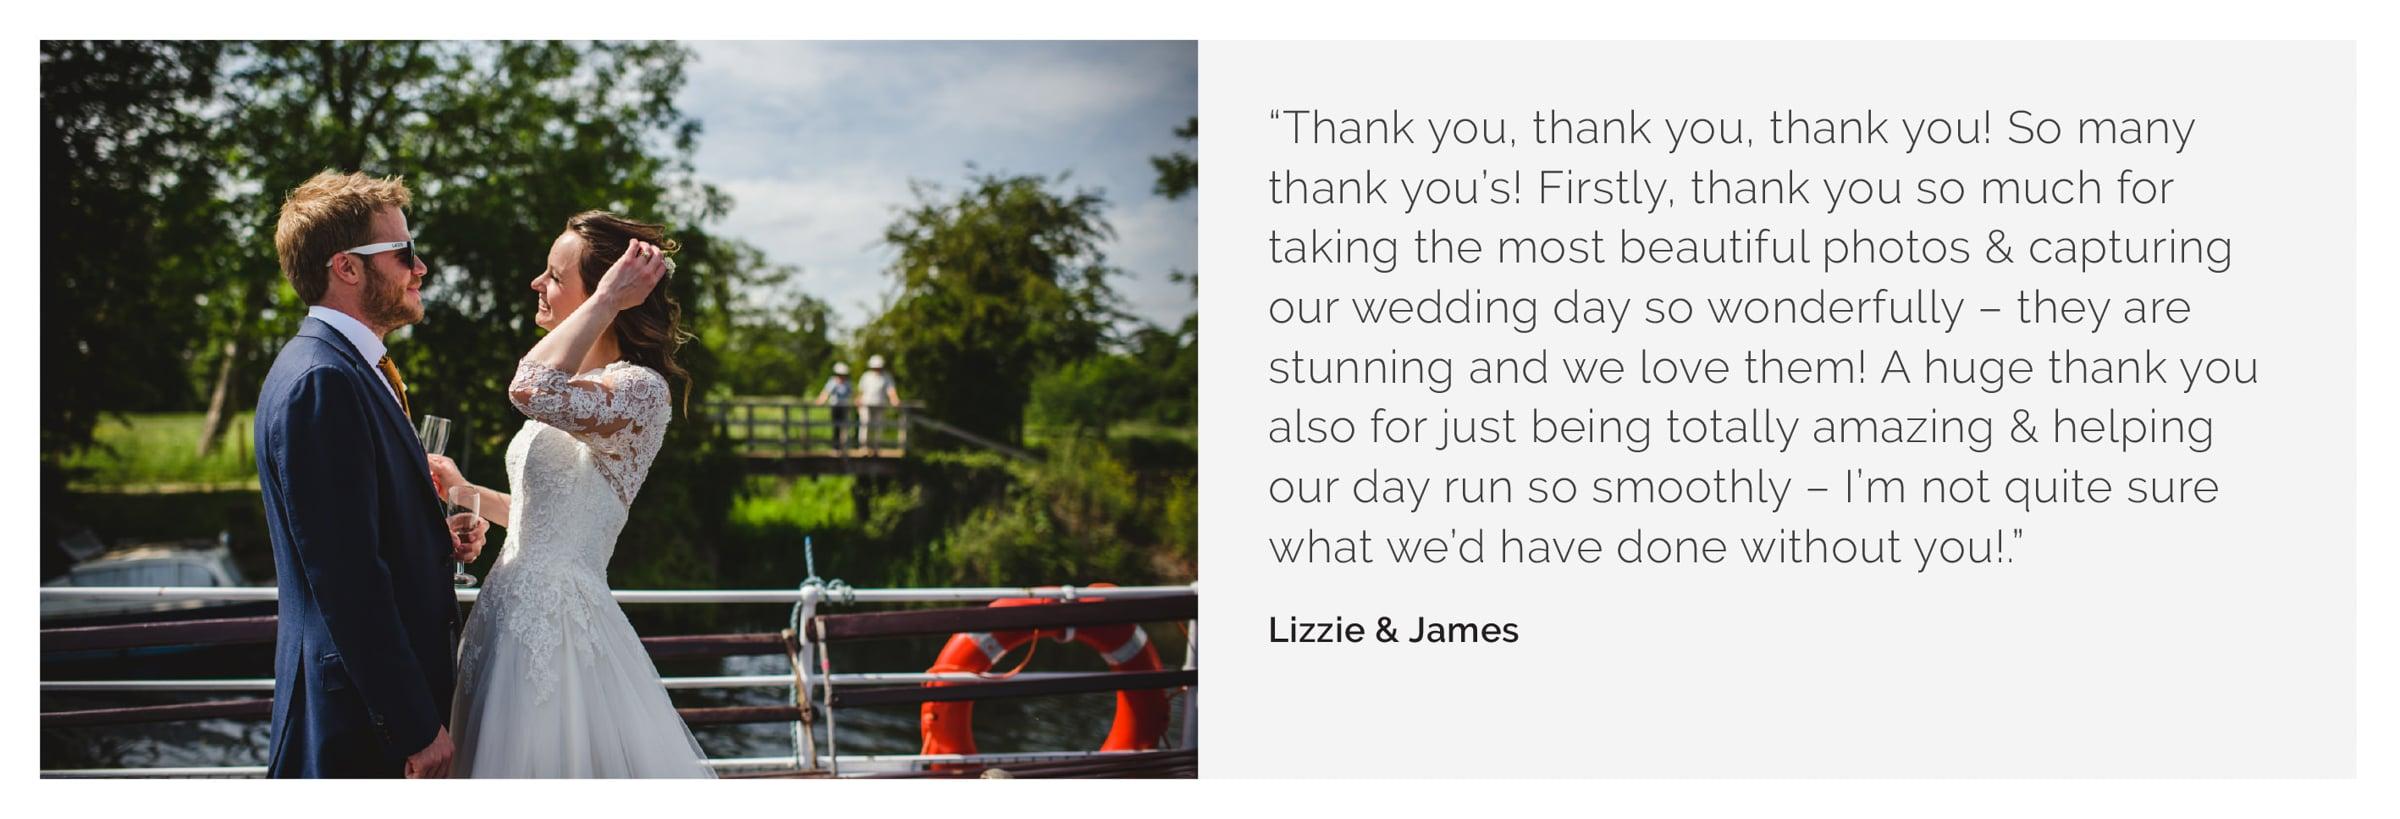 Oxford wedding photography Lizzie James